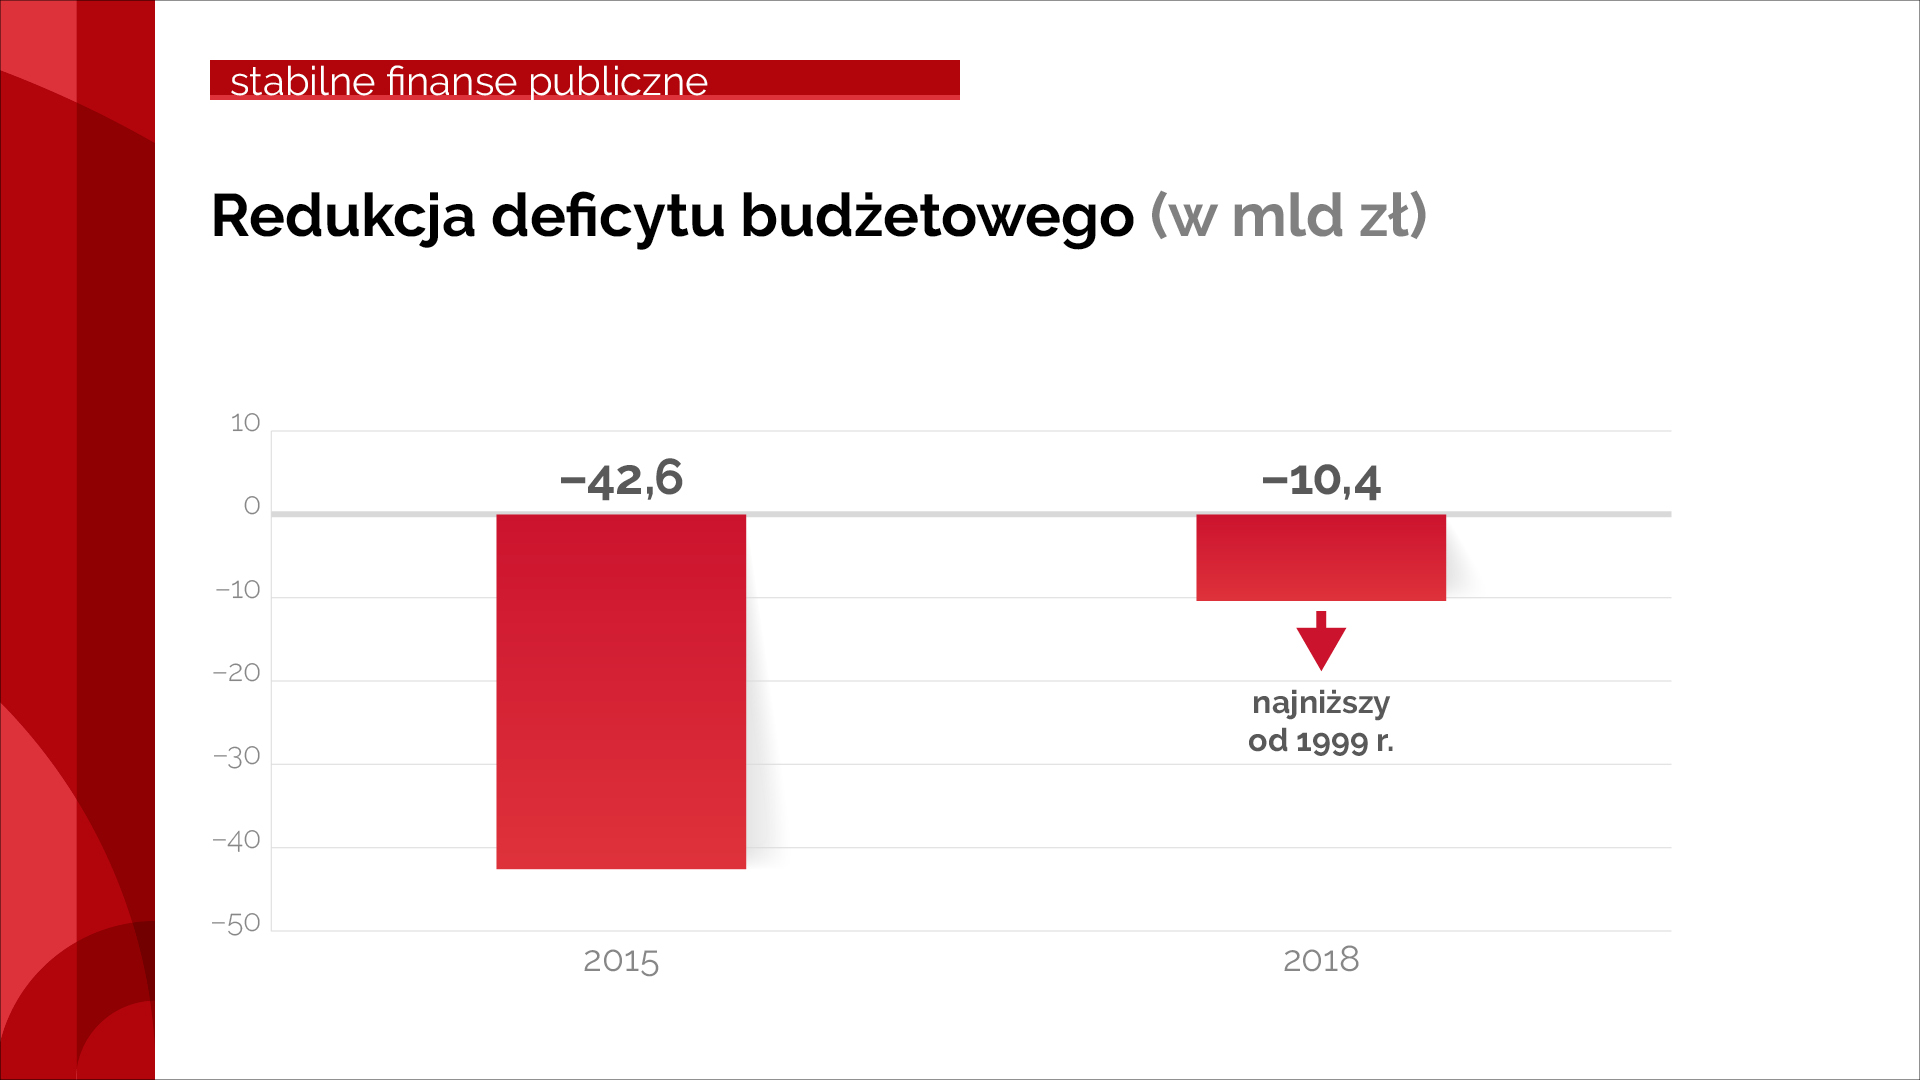 Porównanie deficytu w 2015 i 2018 r.